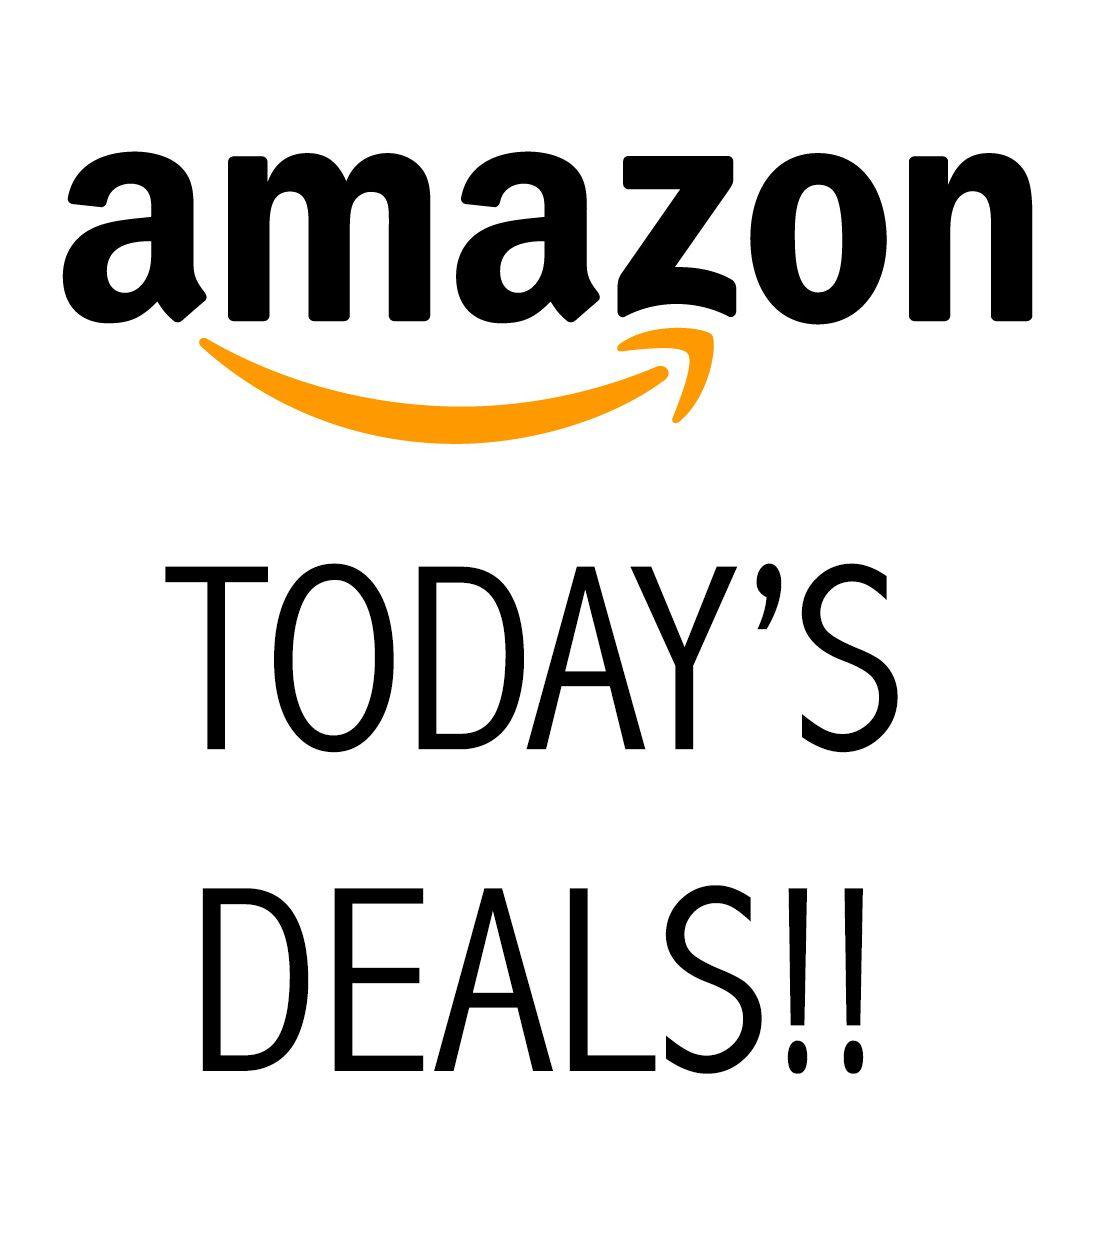 Amazon Deals | Great Finds | Amazon, Amazon deals, Cheap electronics